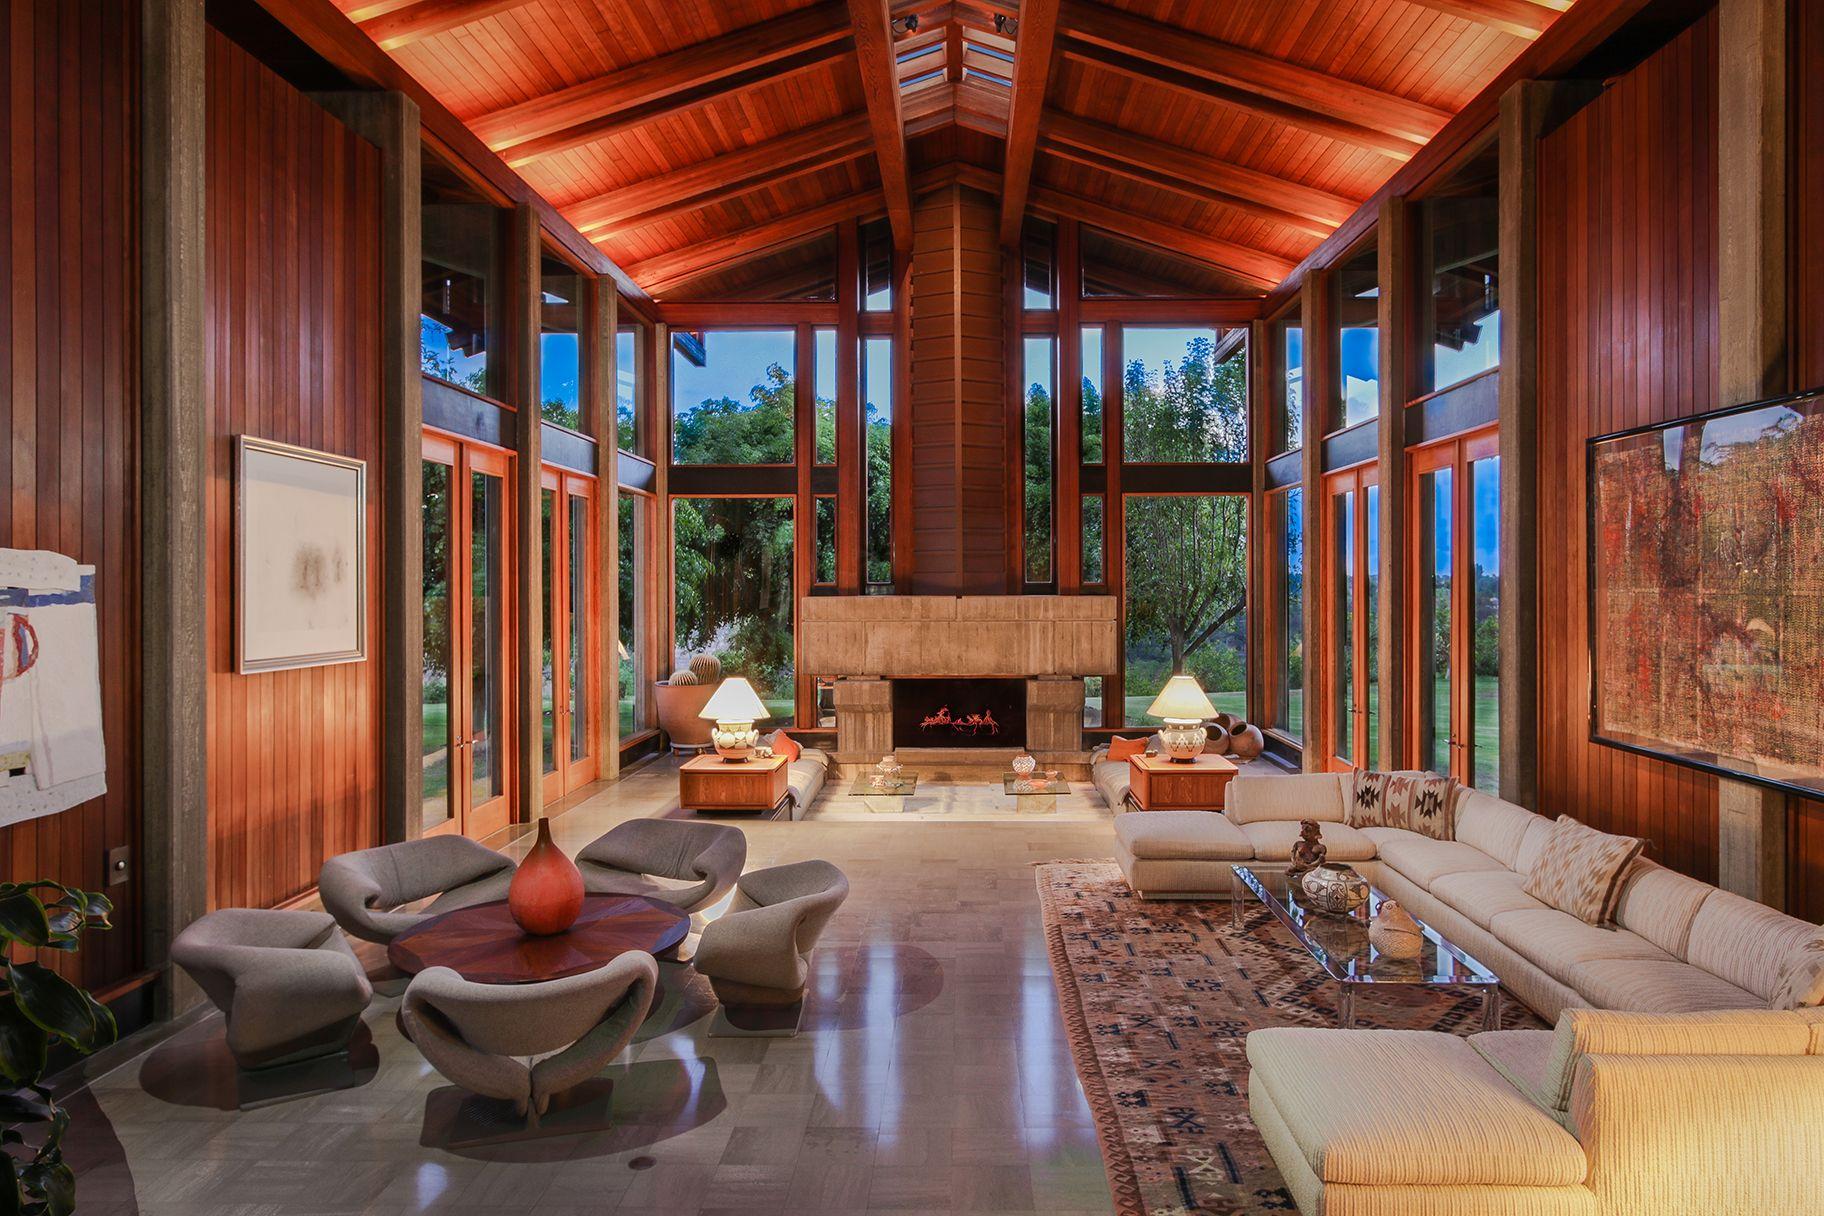 Del dios ranch stunning interiors designed by arthur